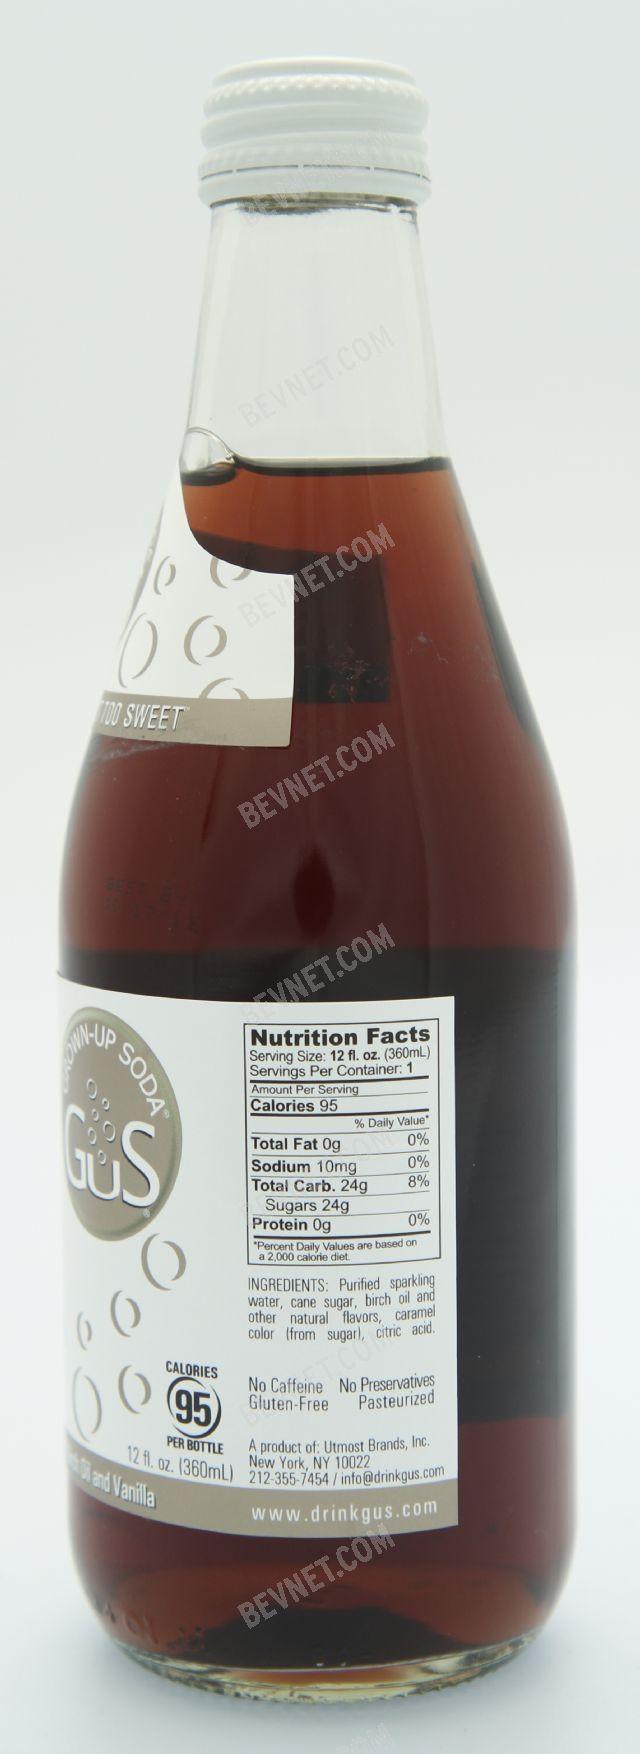 GuS (Grown-Up Soda):